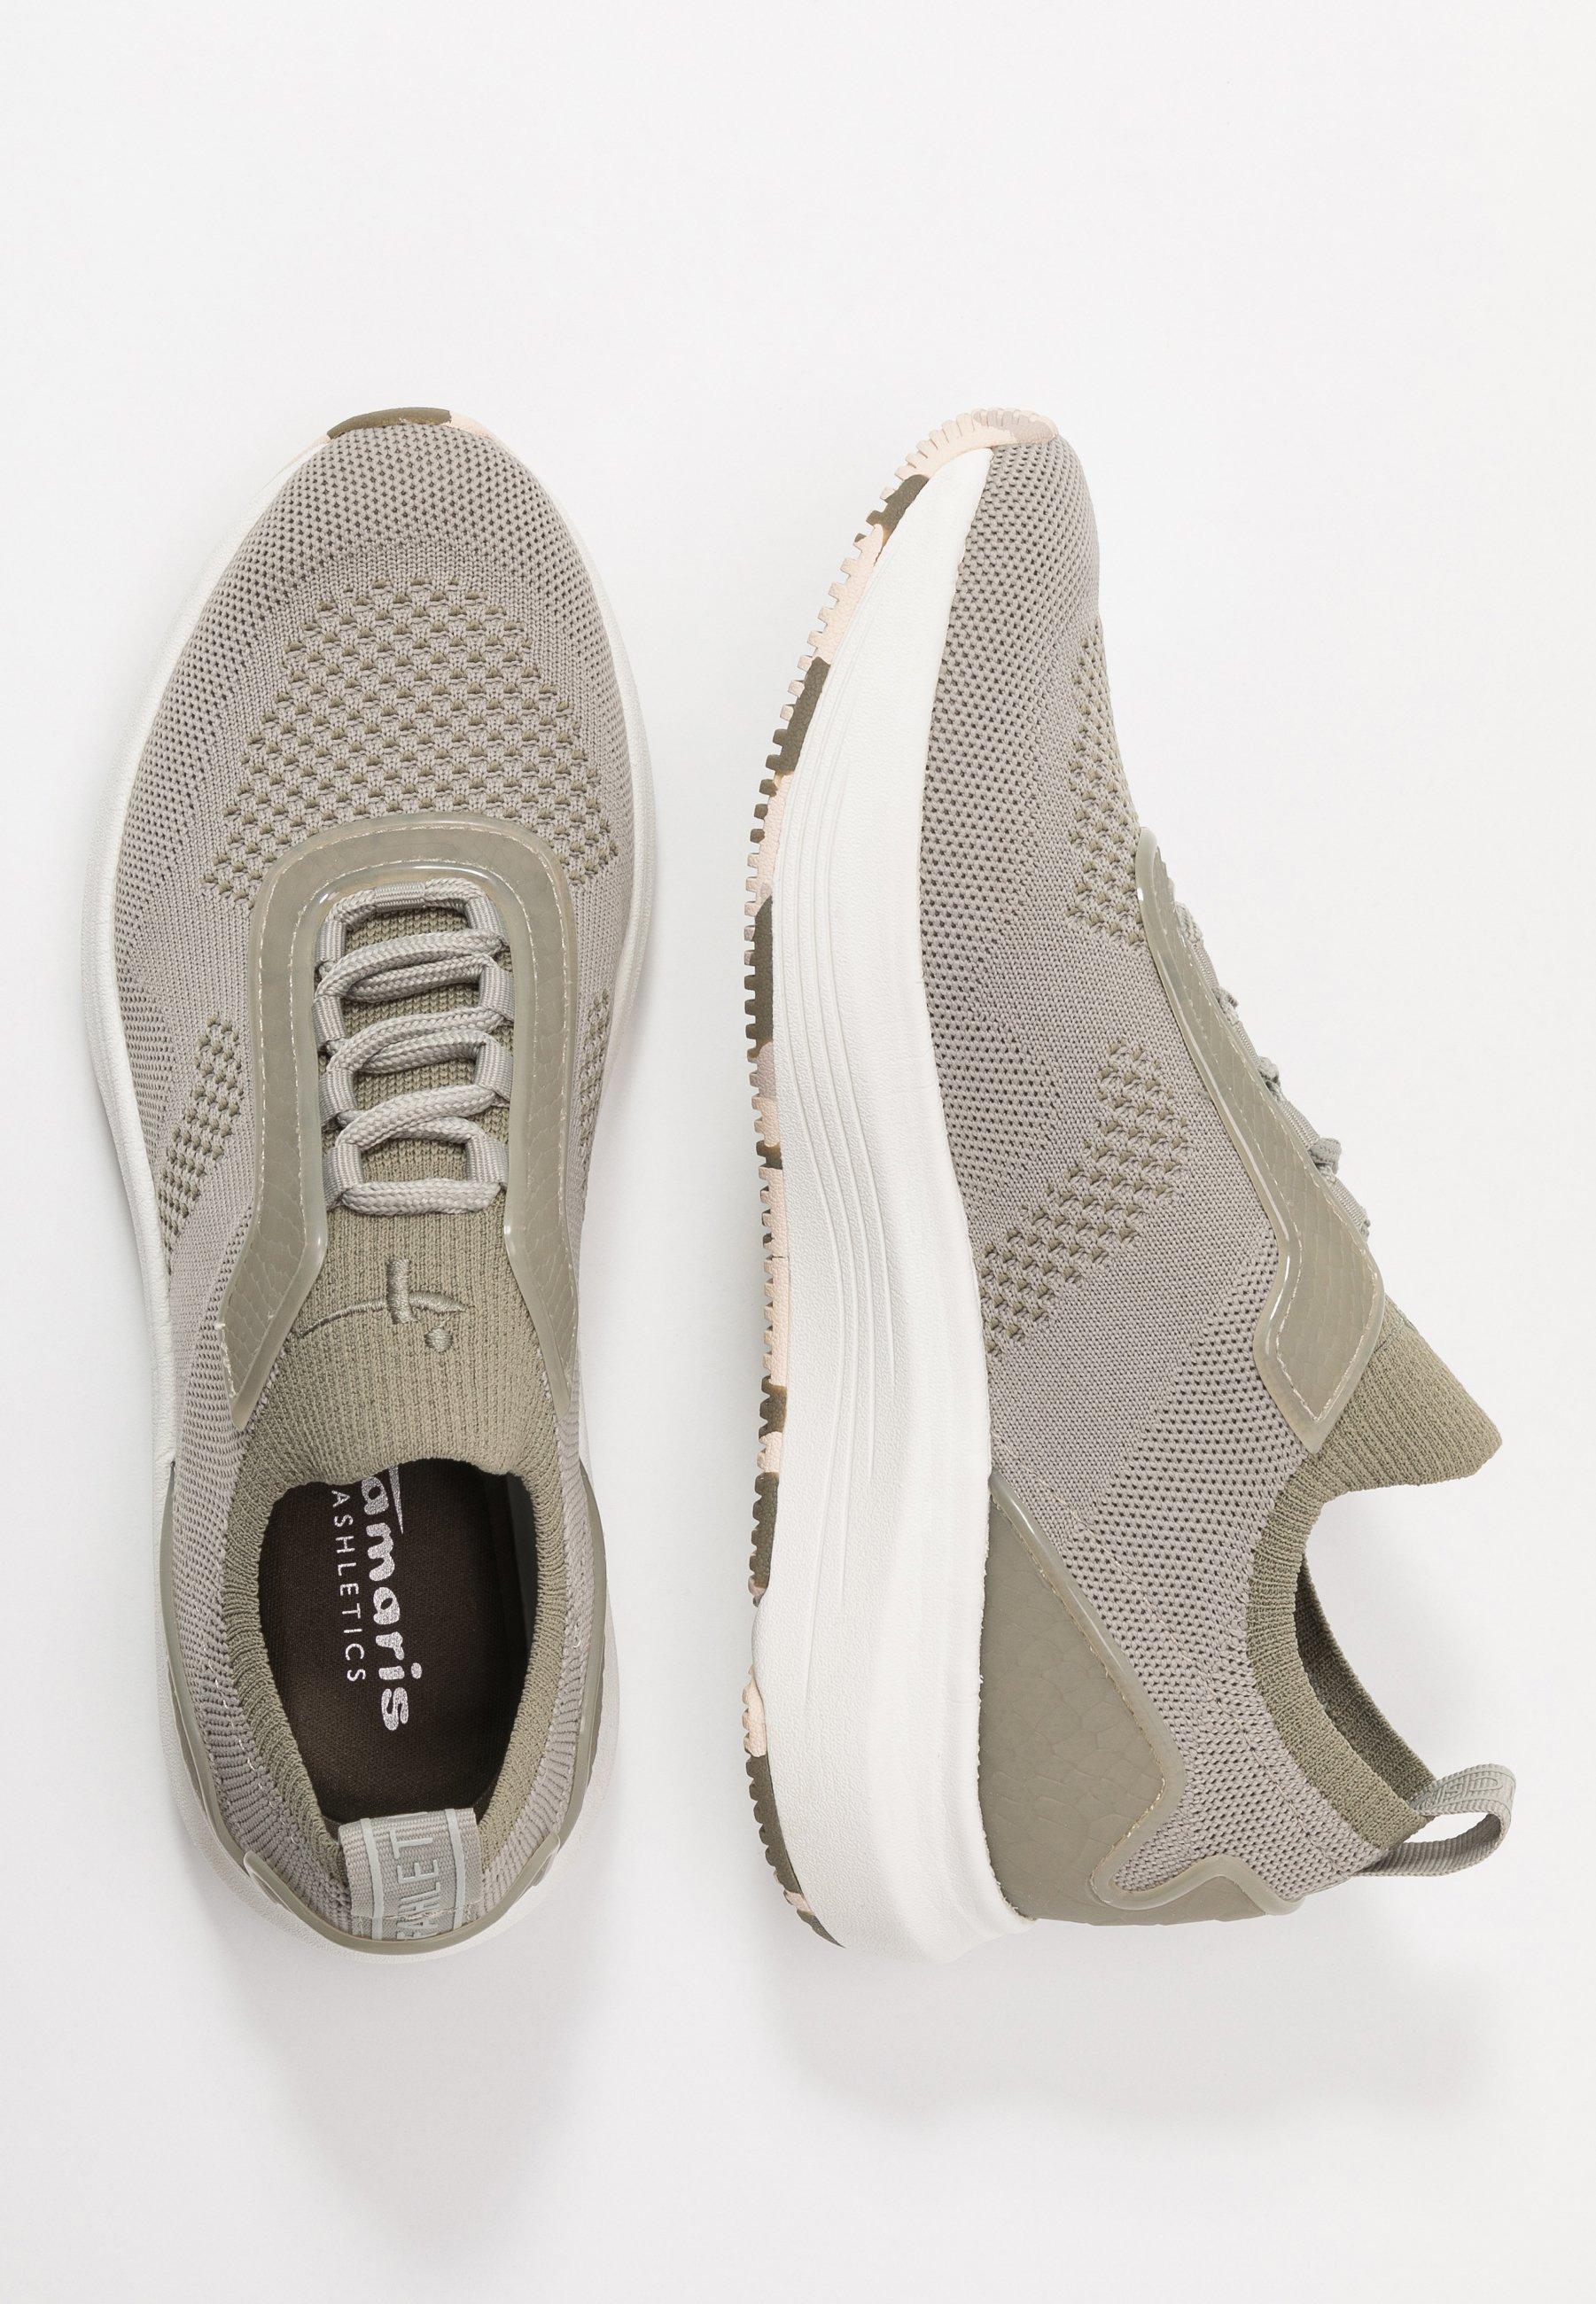 Tamaris Fashletics Lace-up - Sneakers Basse Light Olive e0ryw